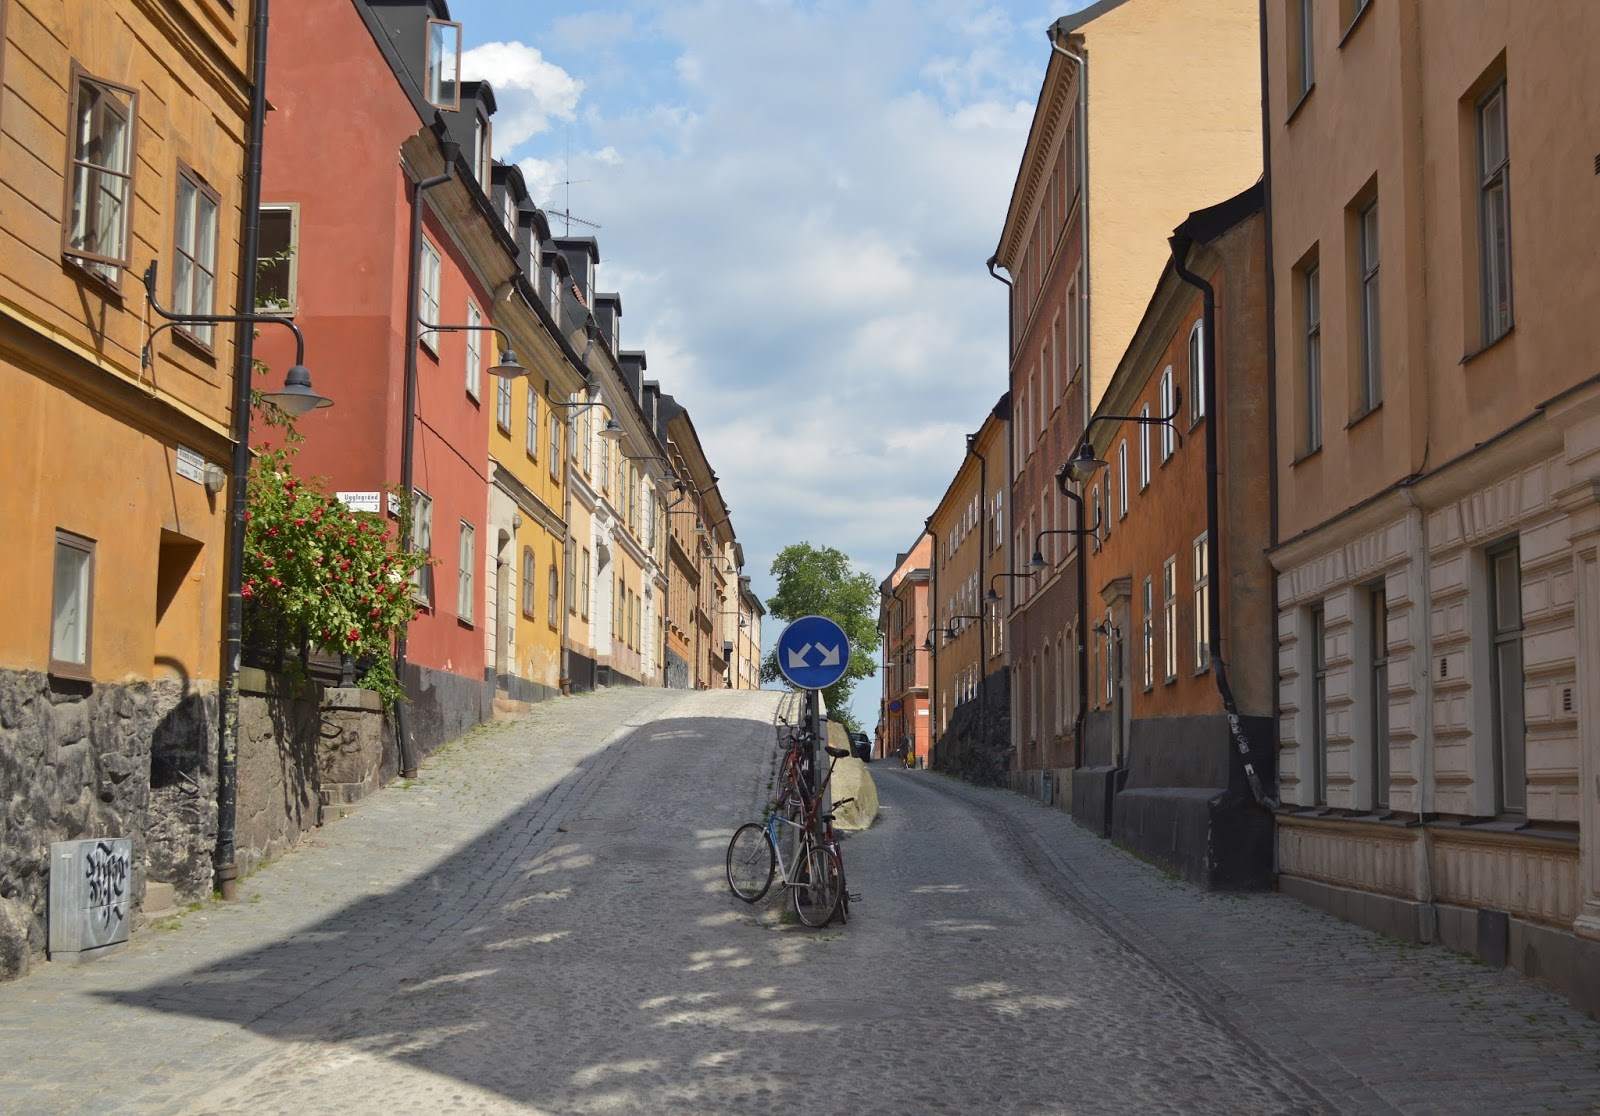 Pastel coloured houses in Sodermalm, Stockholm